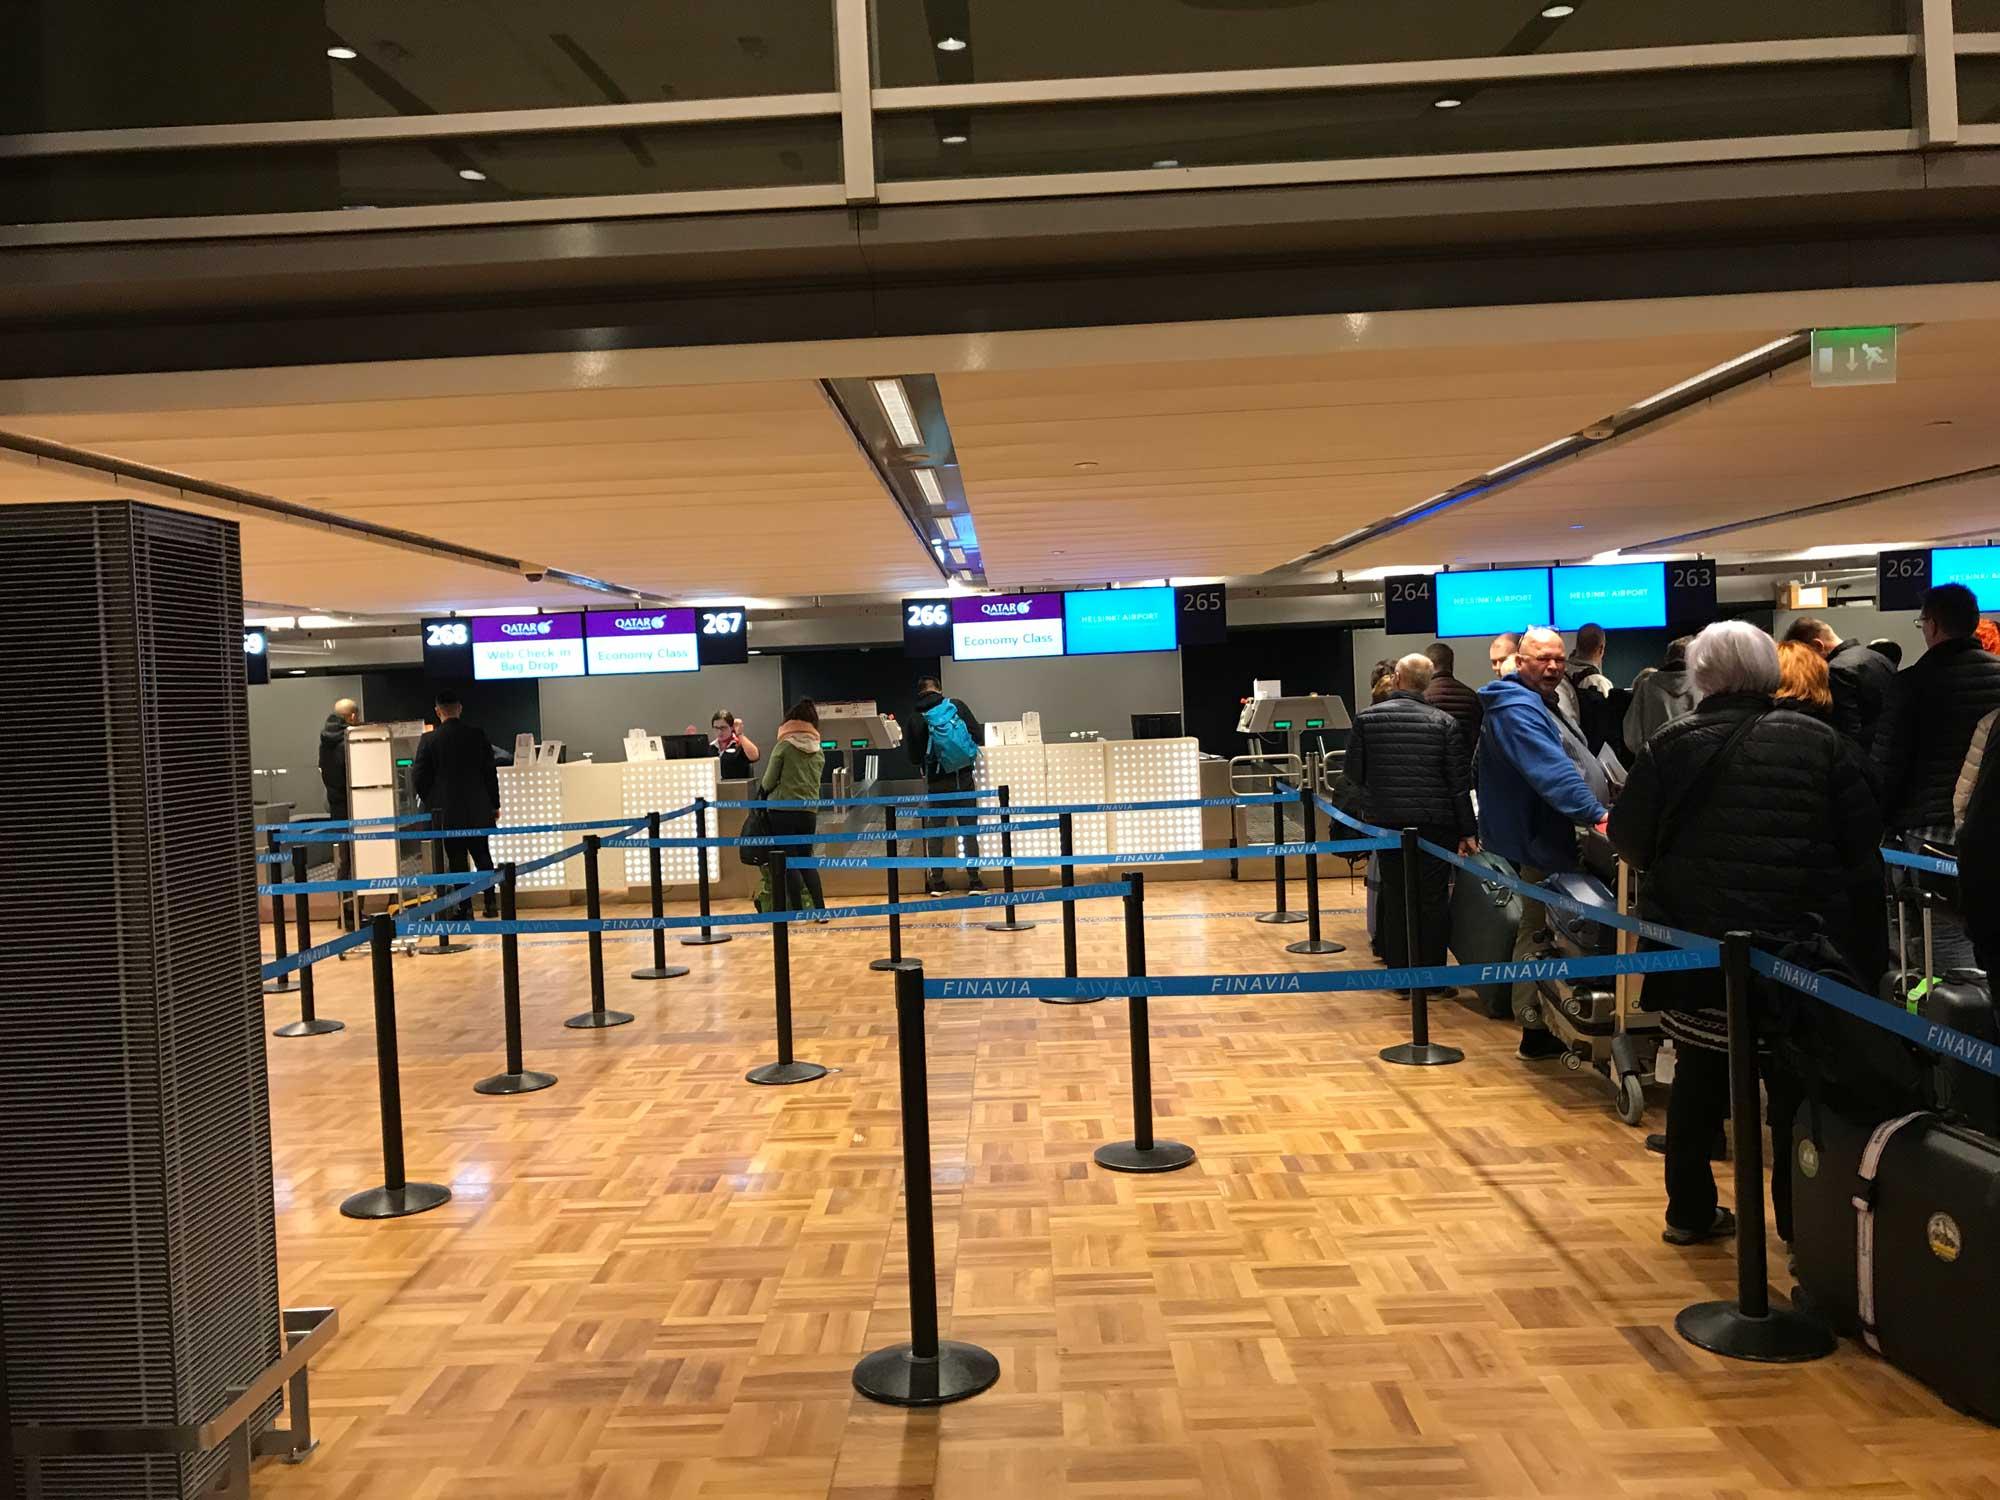 Qatar Airways check in at Helsinki HEL airport - Blog - Screw Them All